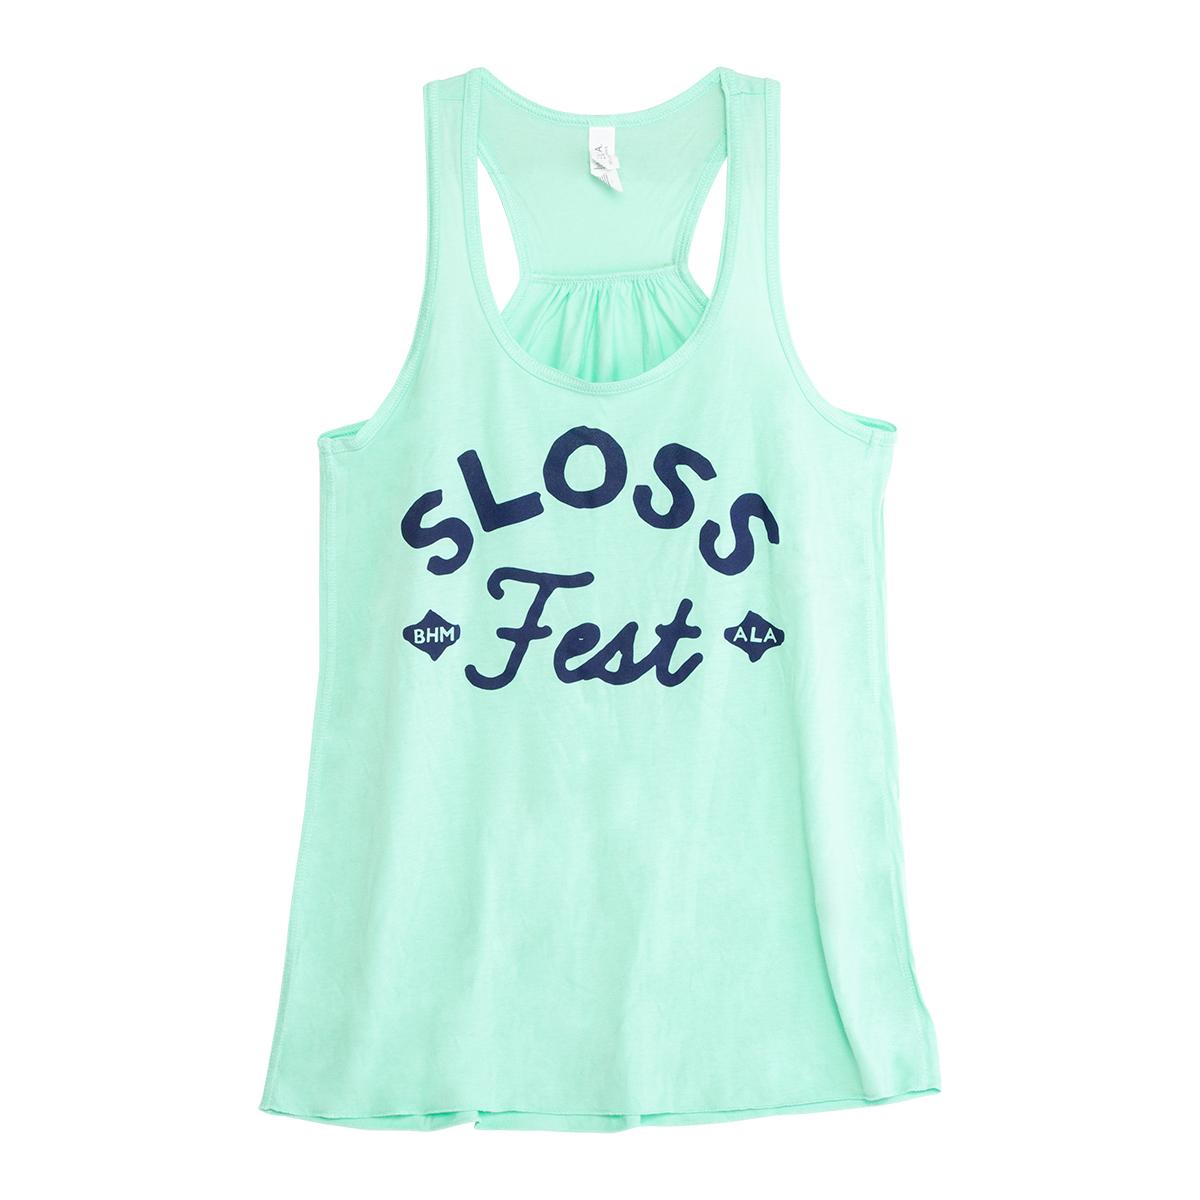 Sloss Music & Arts Festival 2017 Script Logo Ladies Tank